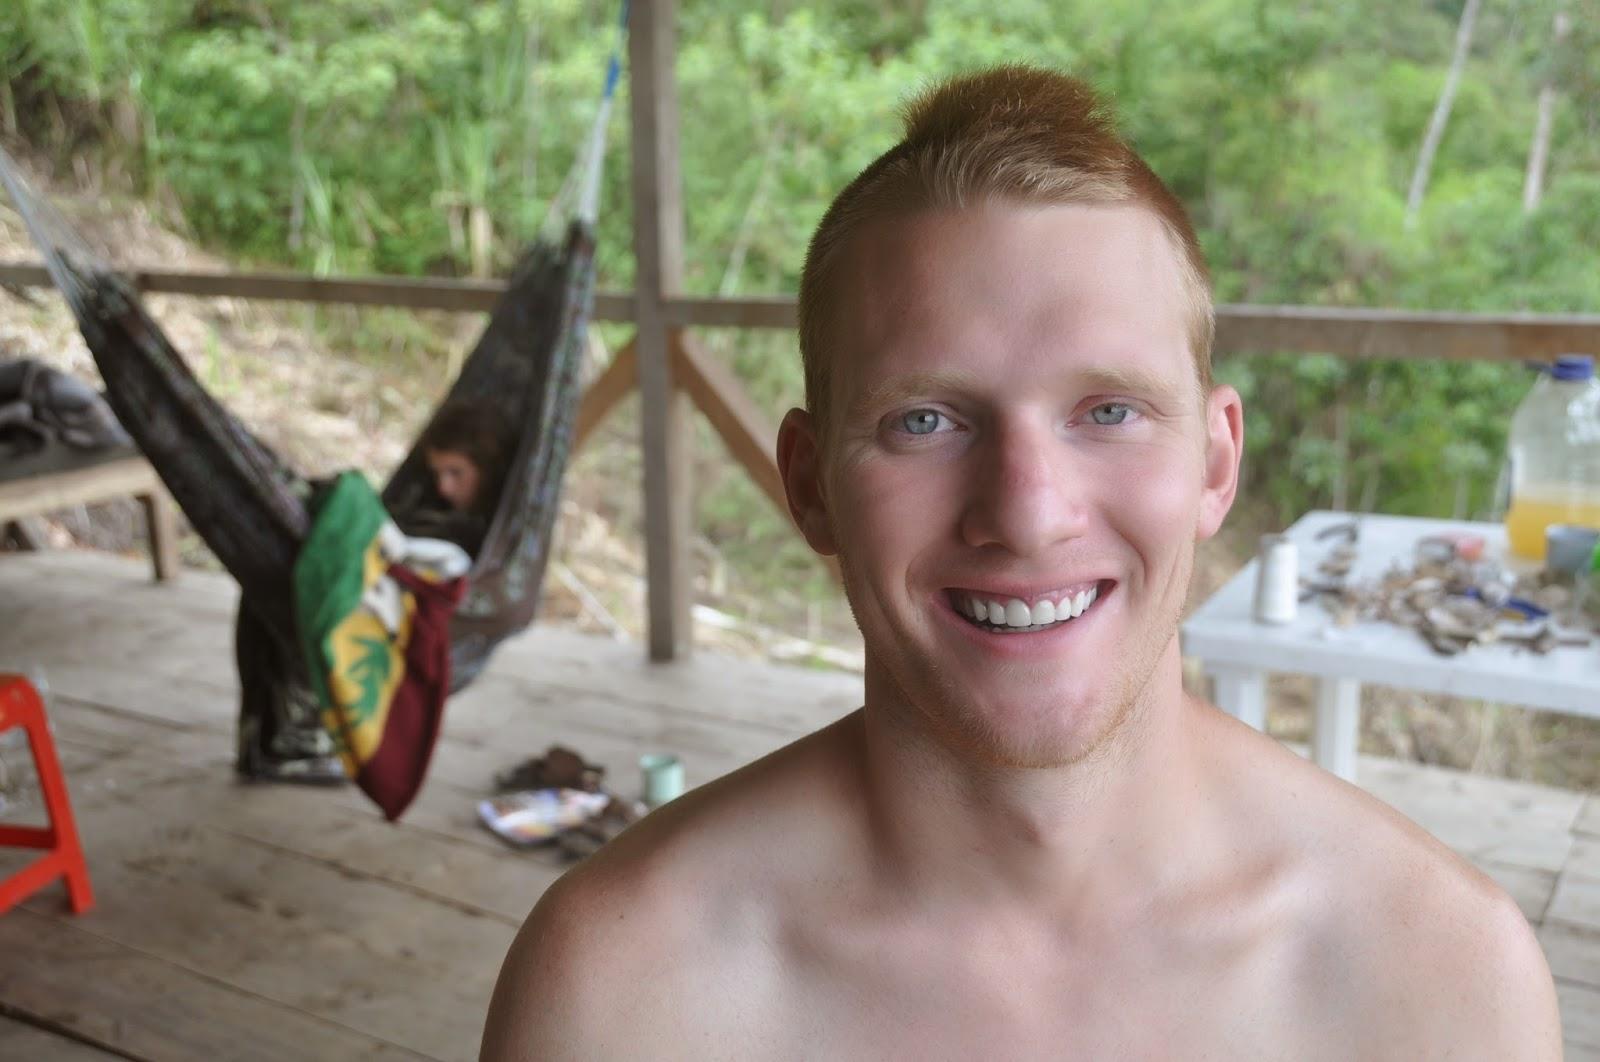 Ben wanted a haircut... so I gave him a Mohawk.